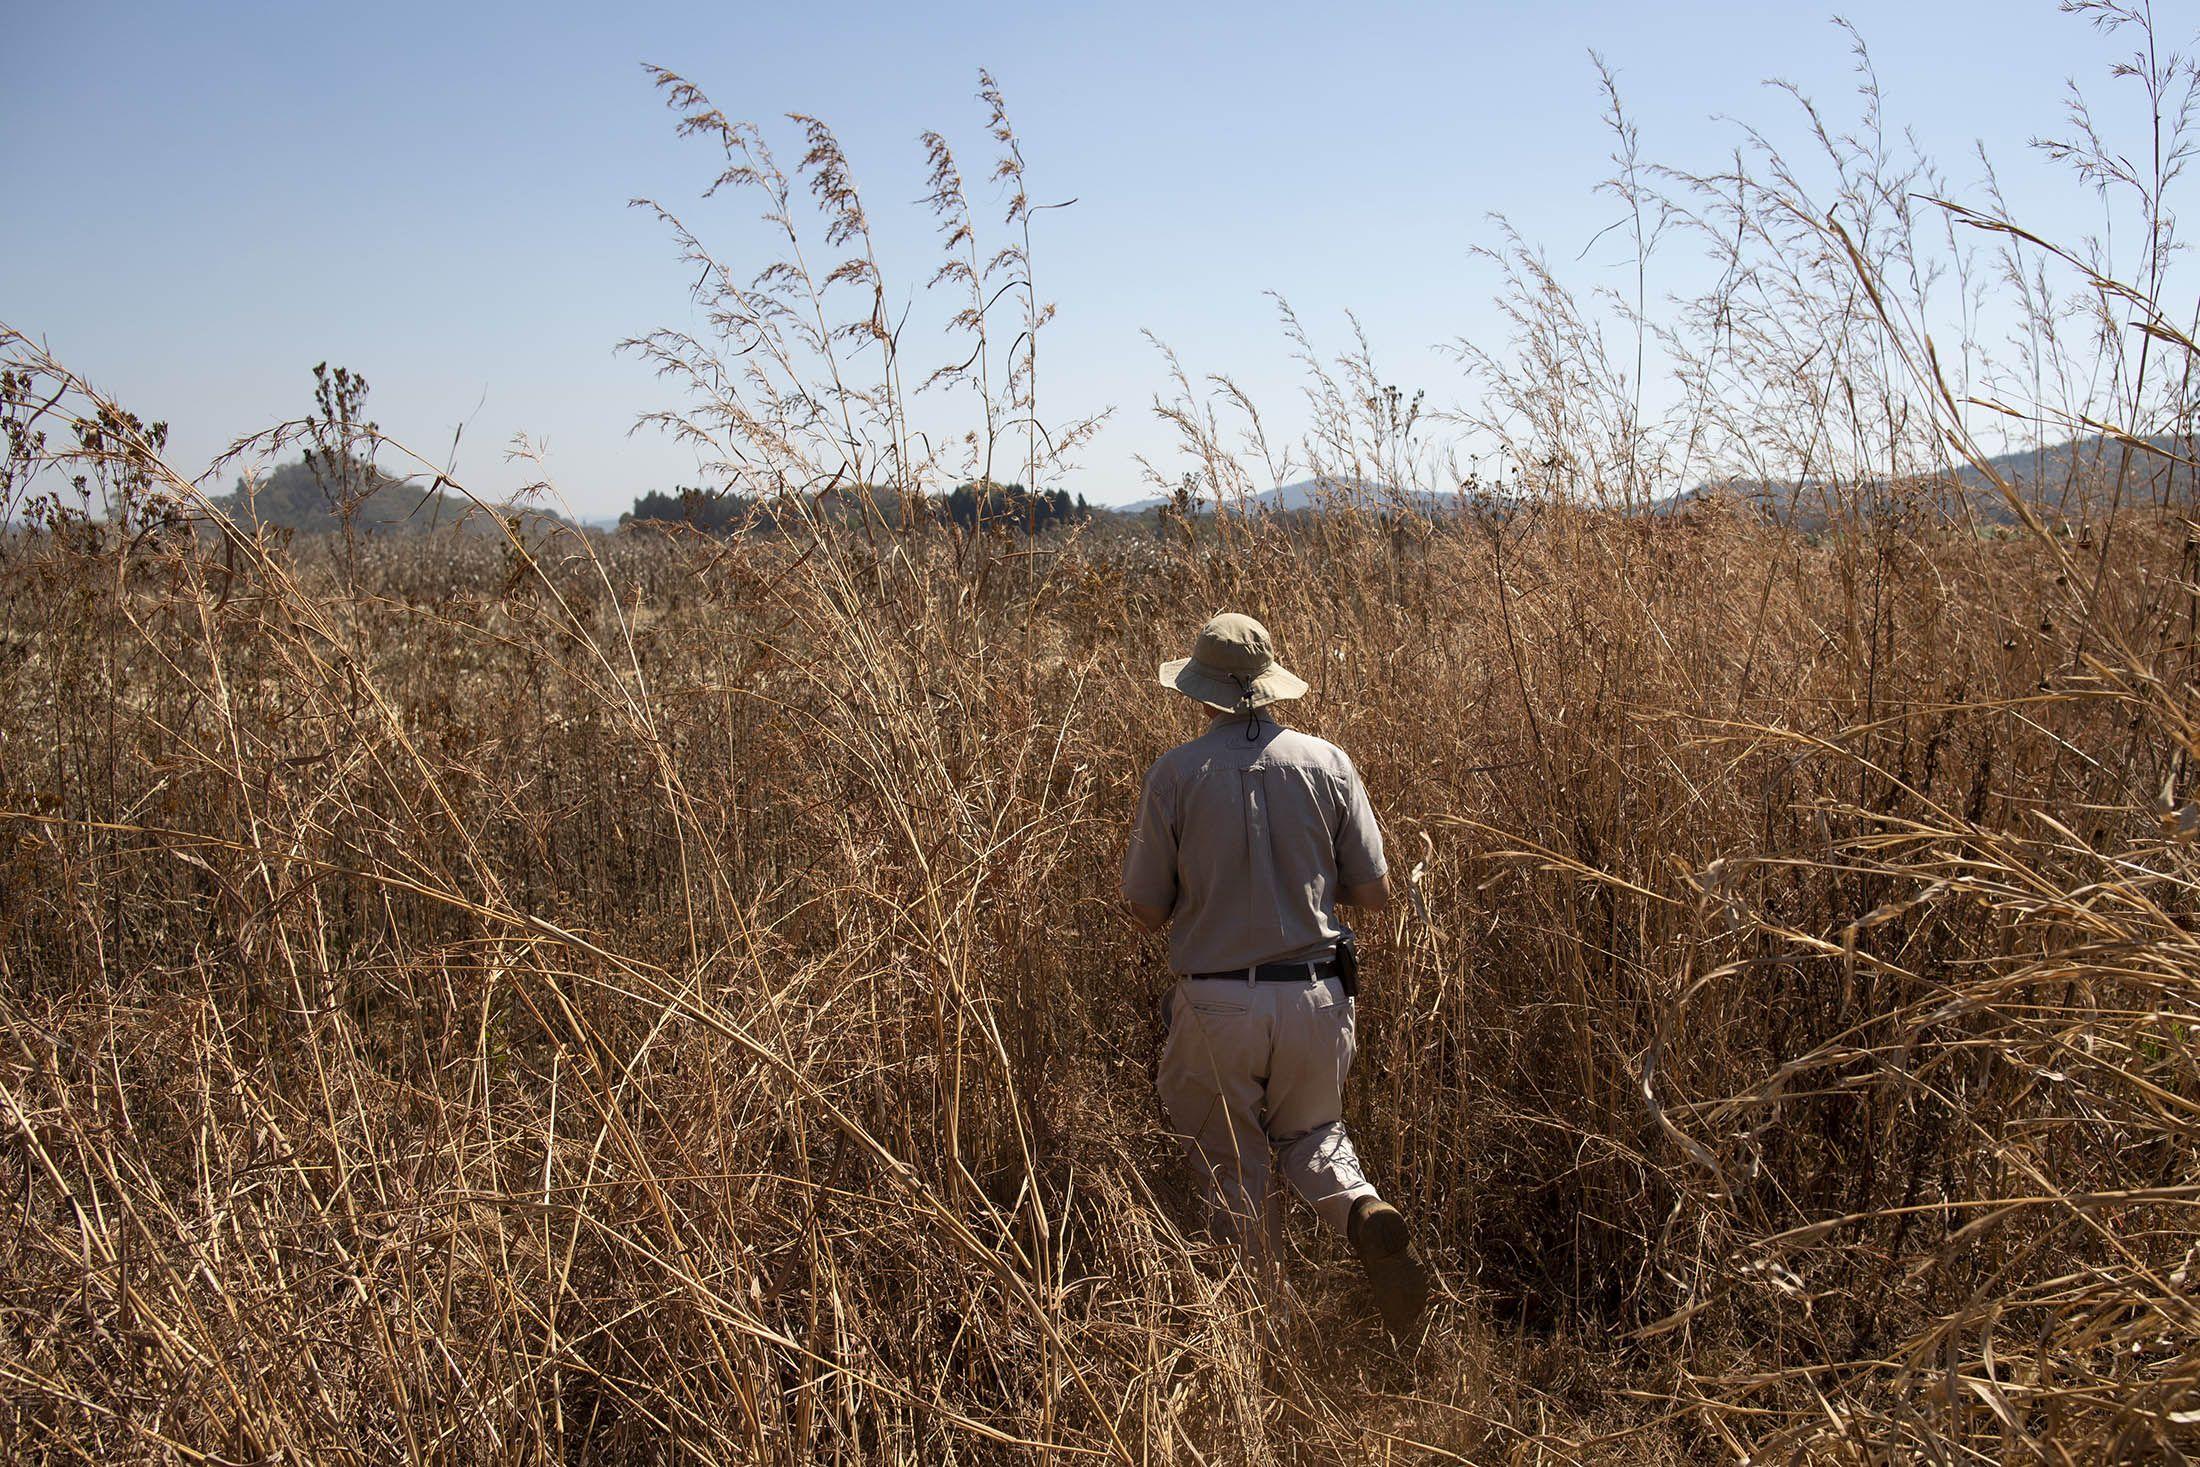 Business Maverick: Two Decades After Land Grab, Zimbabwe Starts Paying Farmers